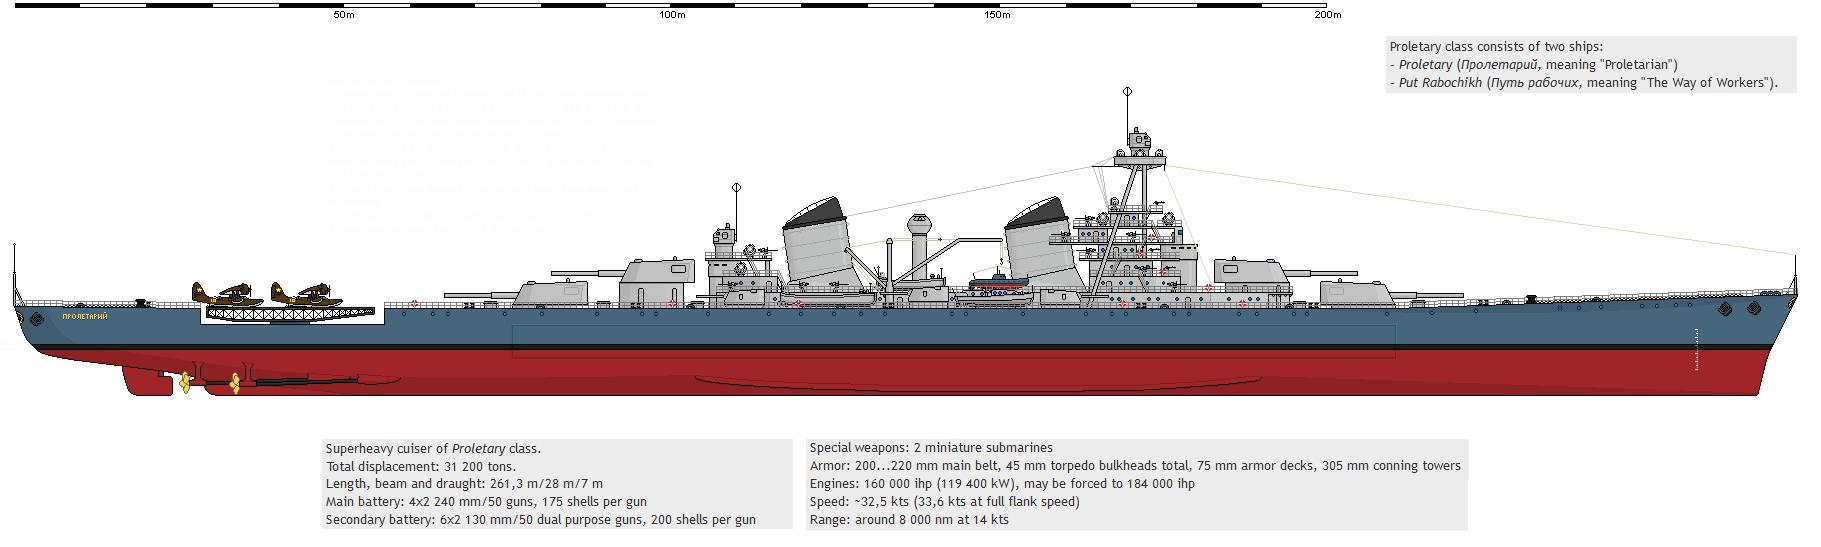 крейсер пр. Х.png